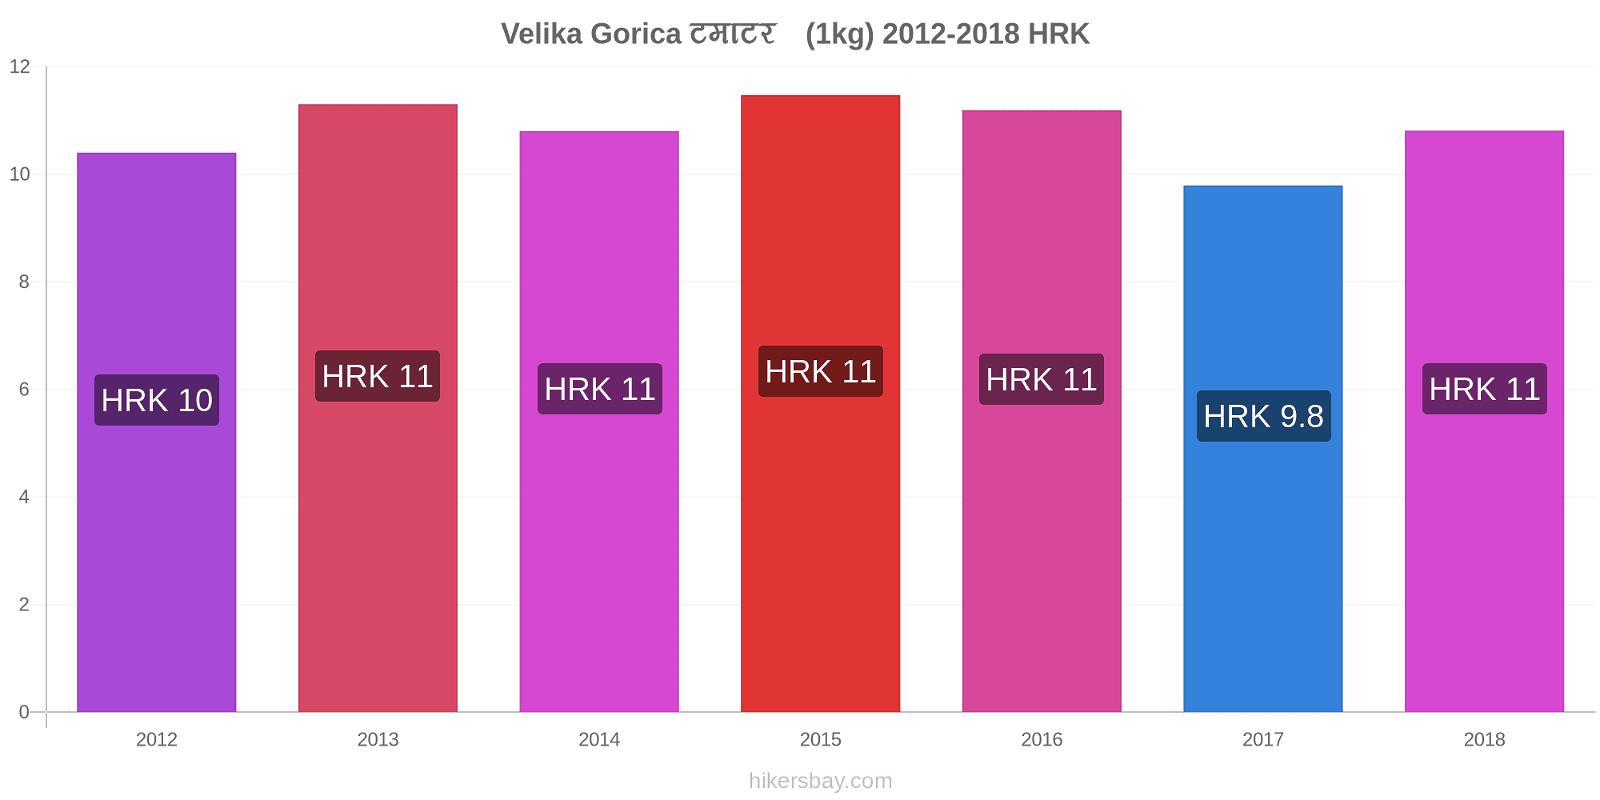 Velika Gorica मूल्य परिवर्तन टमाटर (1kg) hikersbay.com